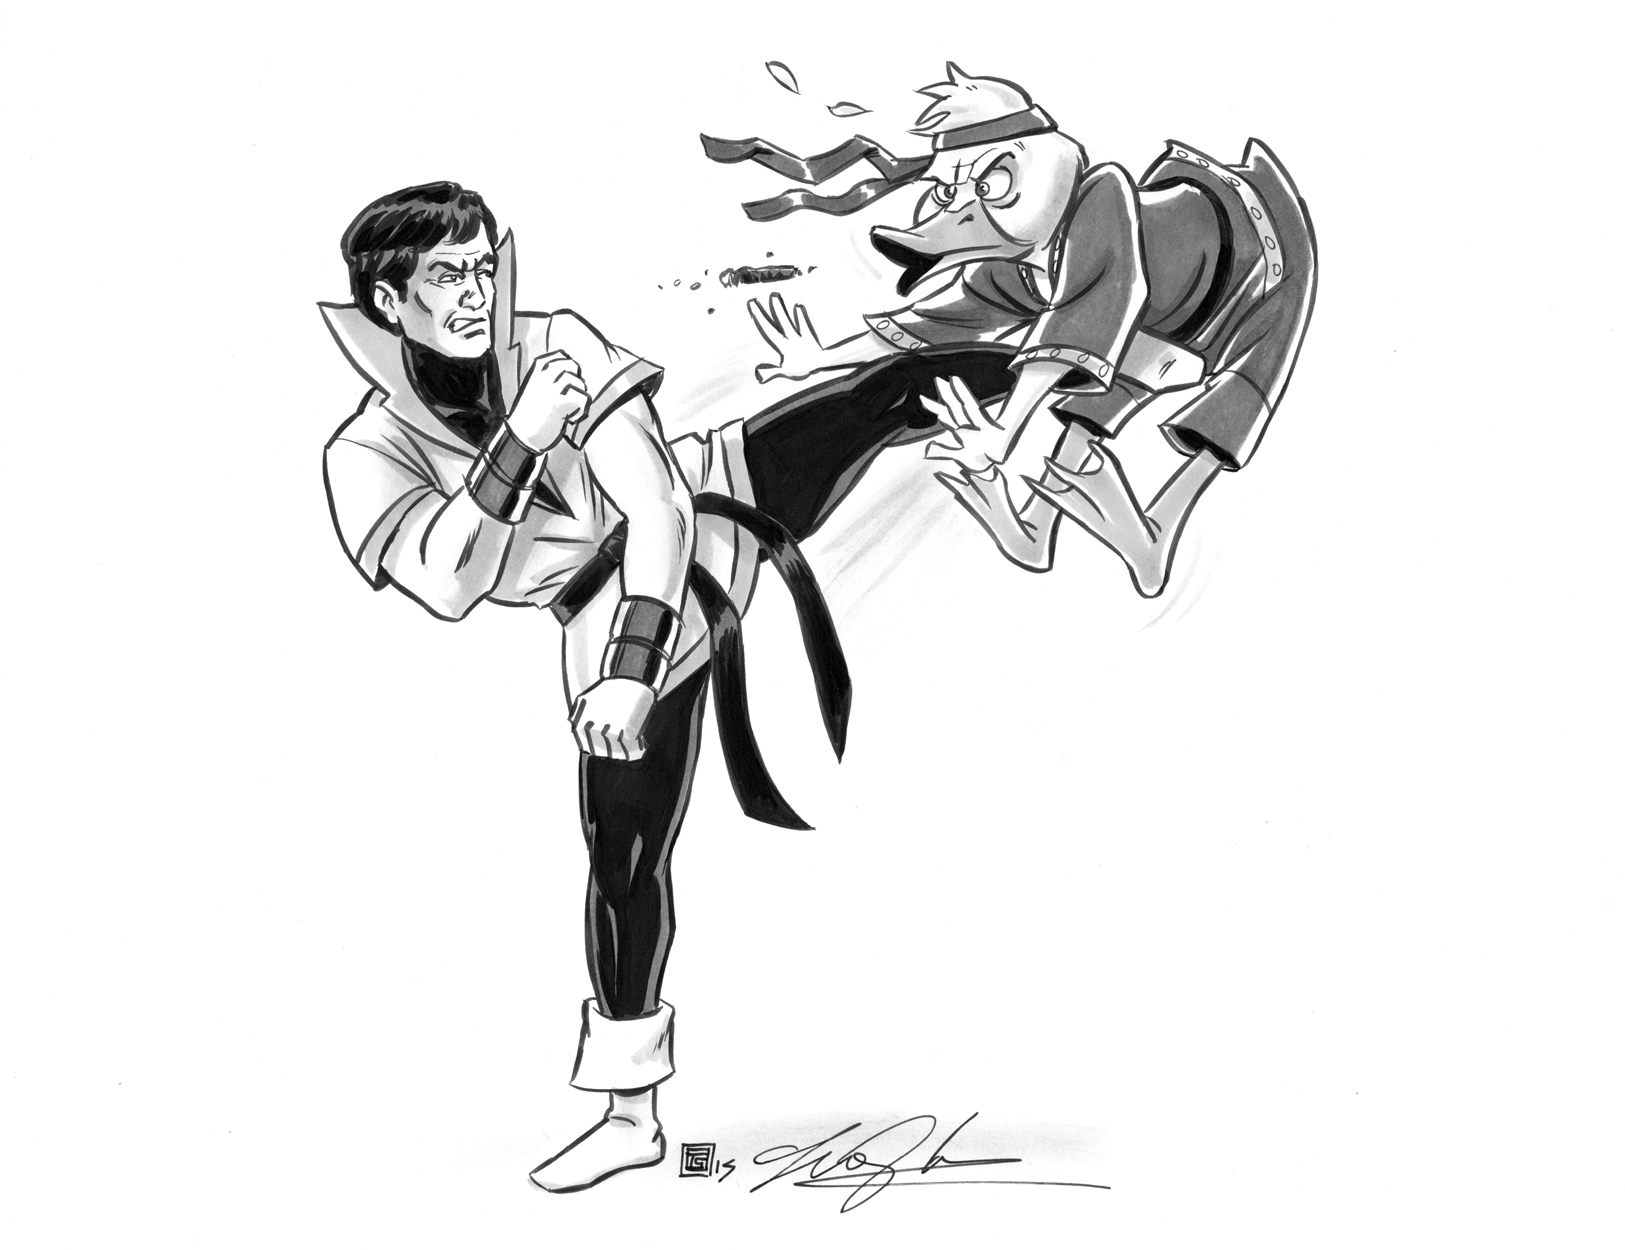 Karate Kid vs  Howard The Duck by Tim Shinn, in Travis Ellisor's